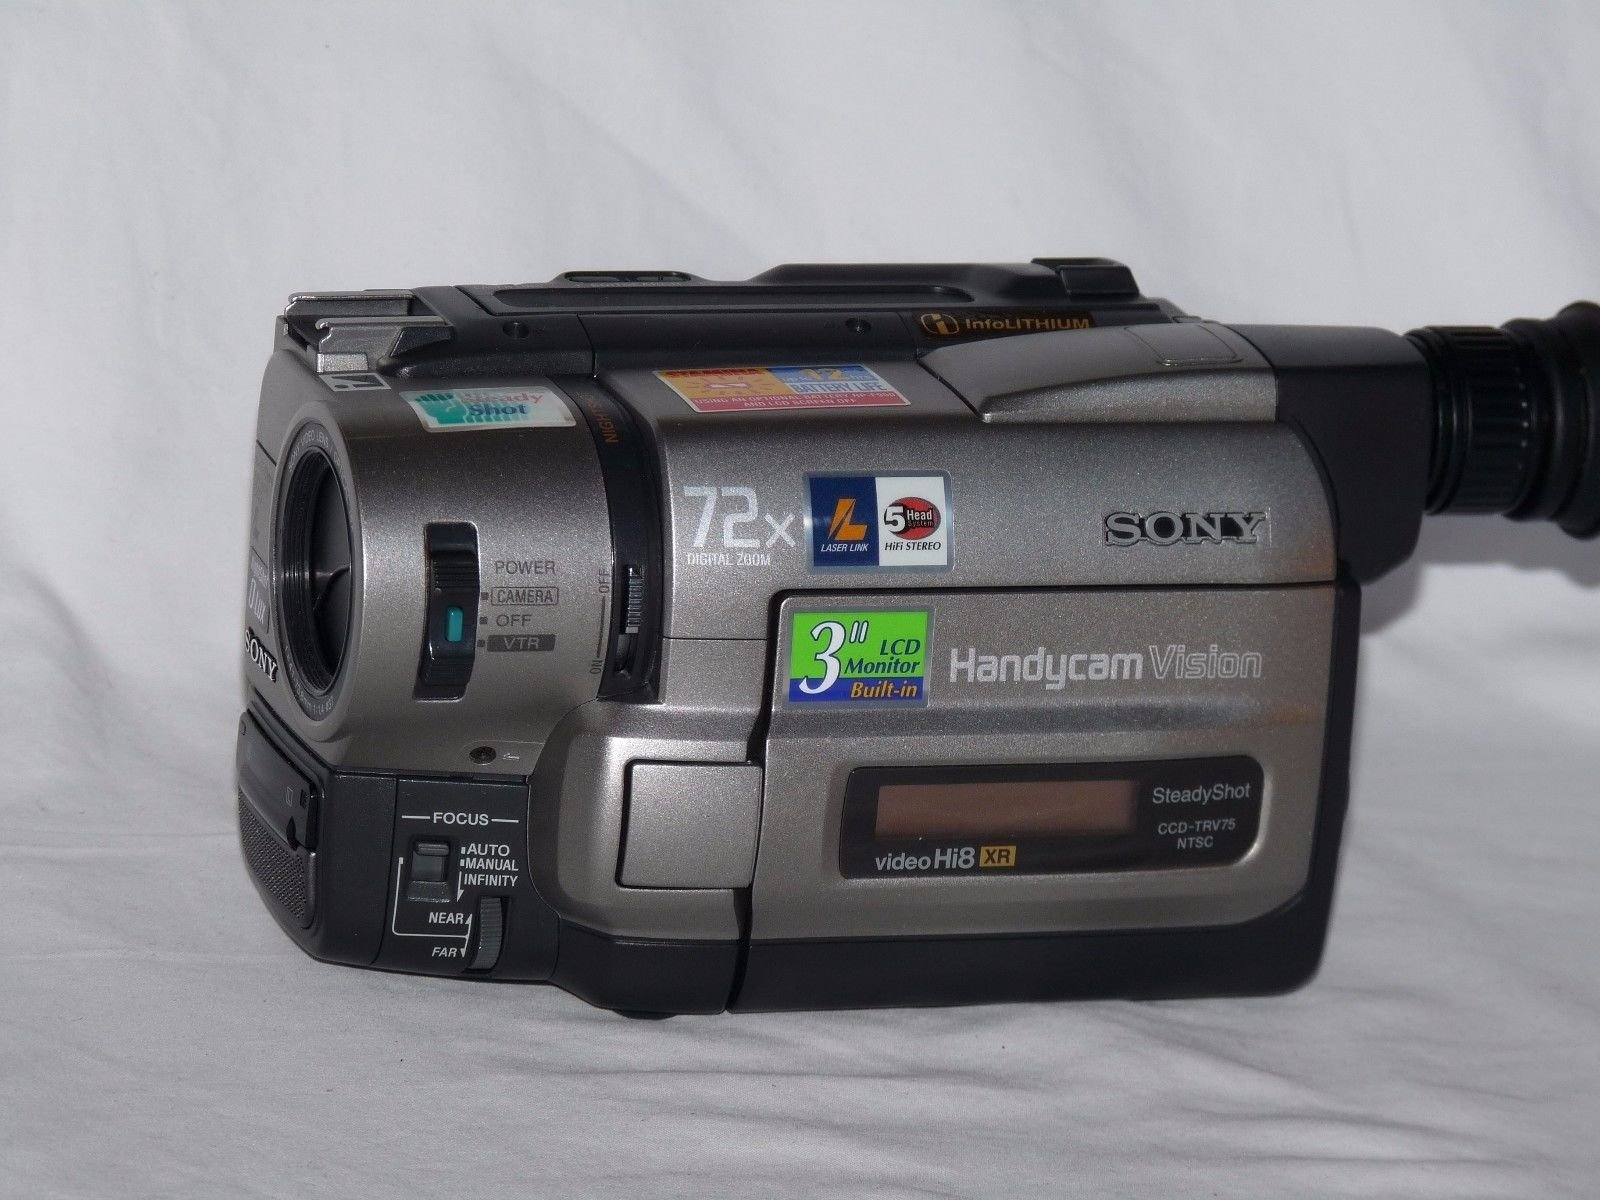 buy sony ccdtrv75 hi8 handycam camcorder 72x digital zoom in cheap rh guide alibaba com sony video 8 xr handycam manual sony handycam vision ccd-trv108 ntsc video hi8 manual